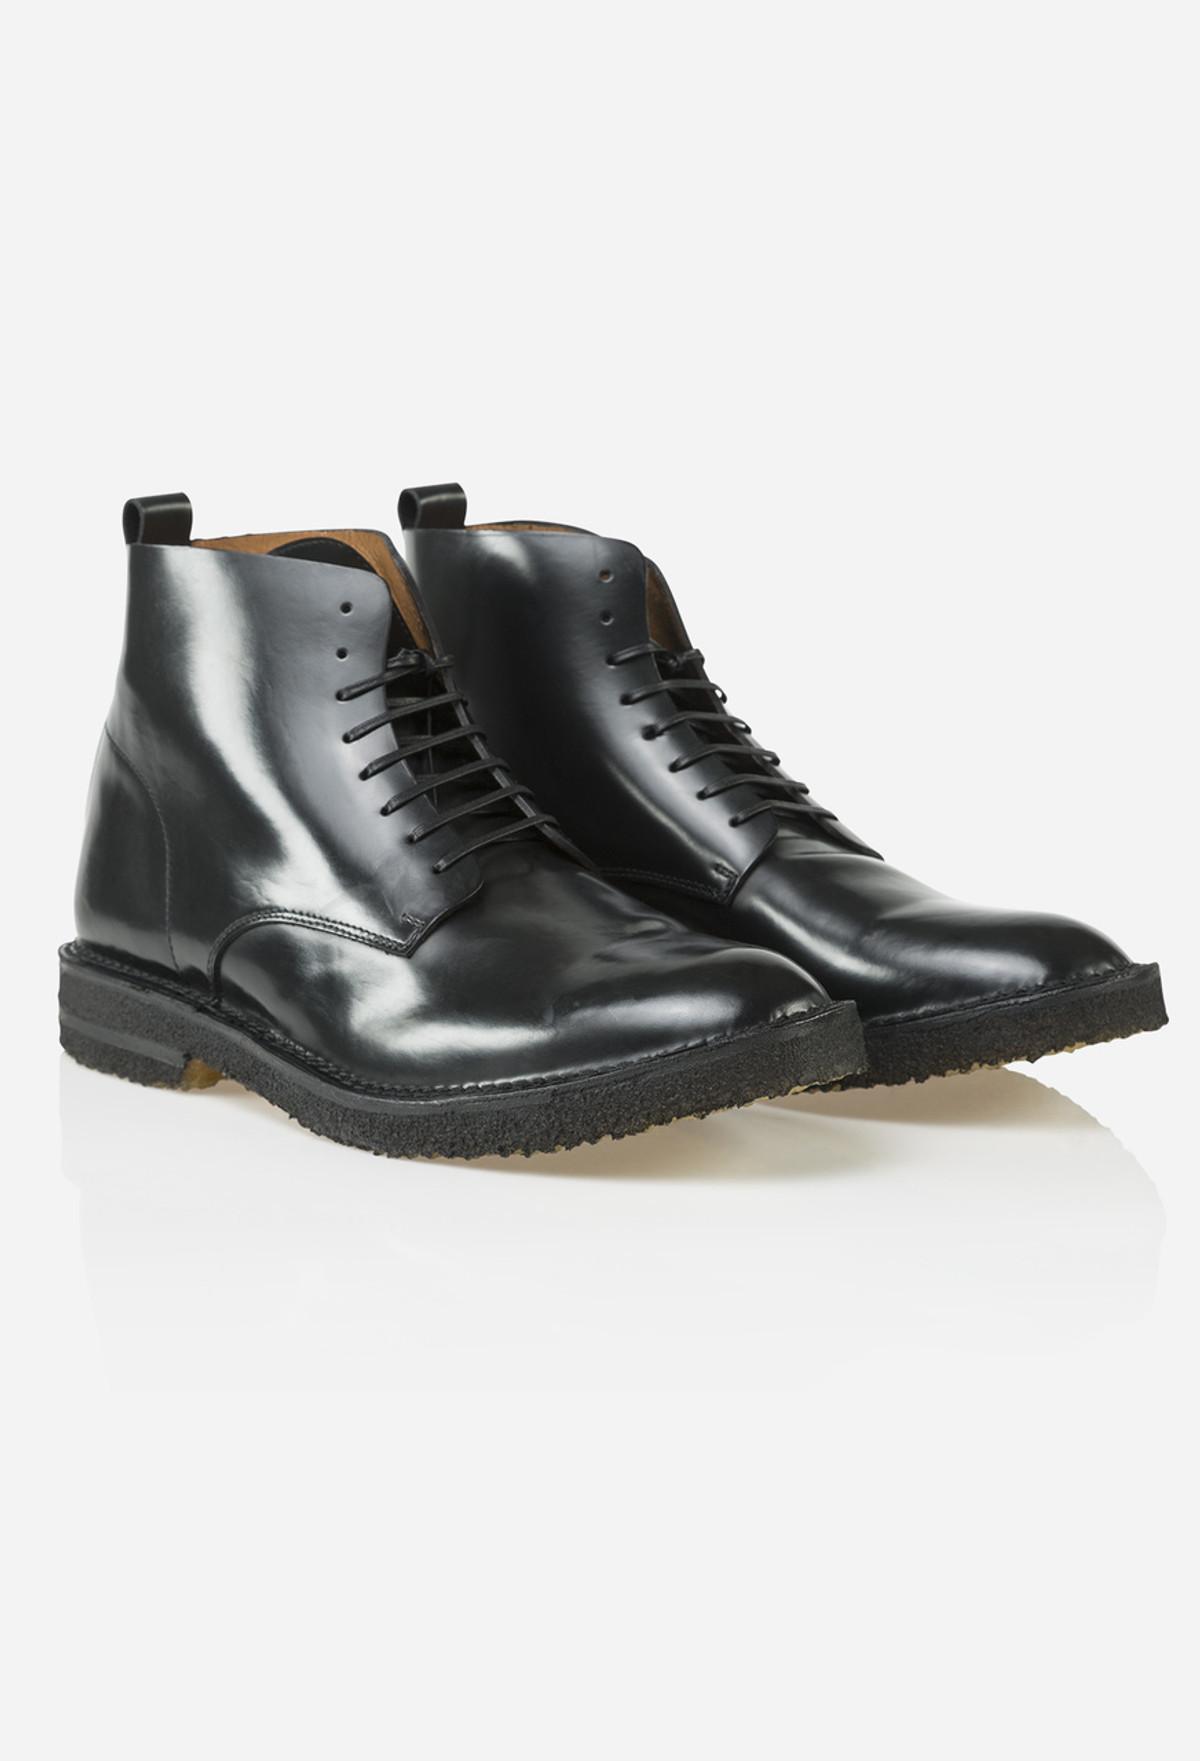 Black Patent Leather